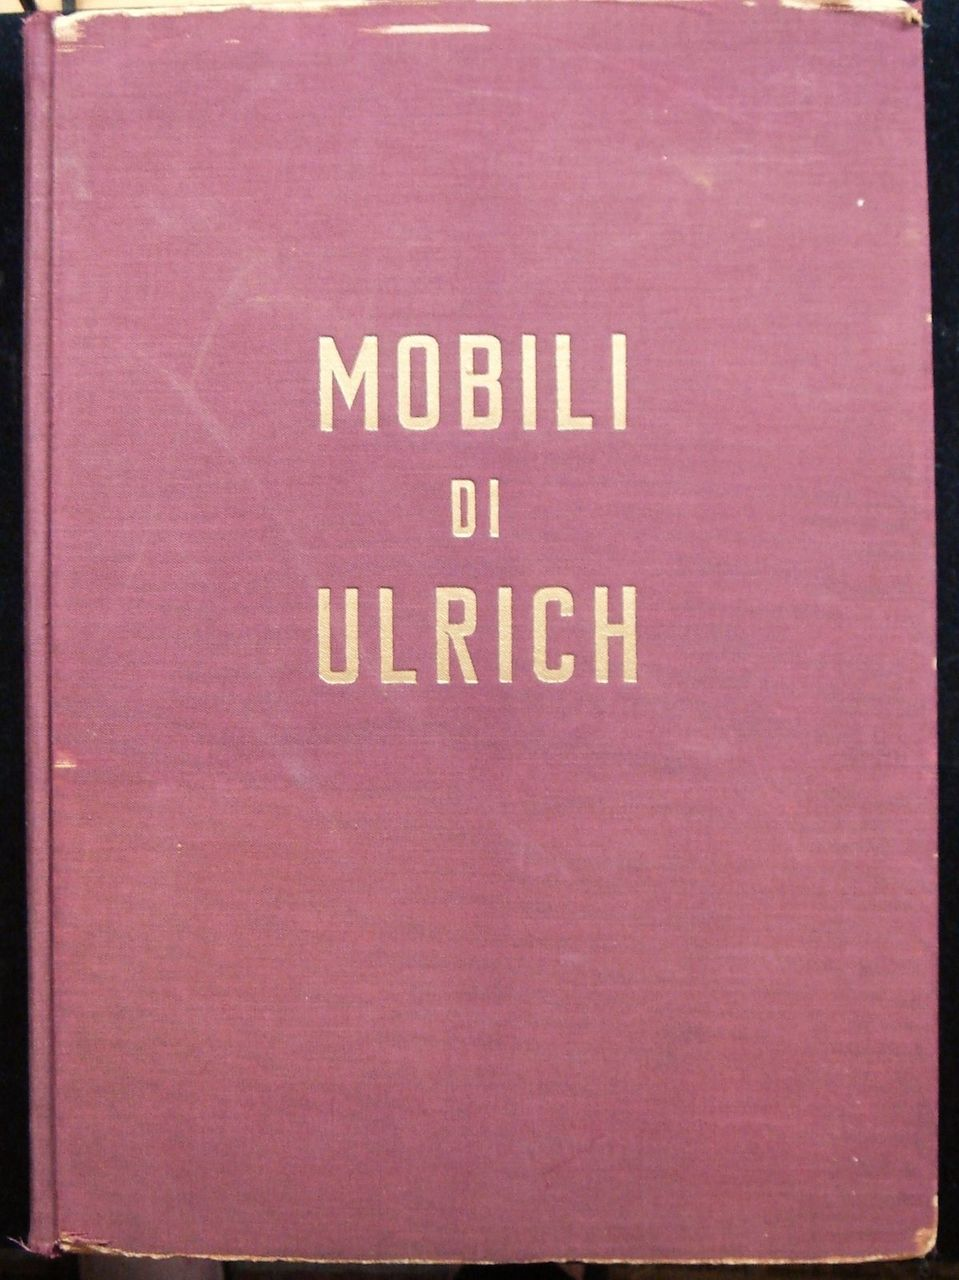 MOBILI DI ULRICH, by G. Morazzoni - 1945 [Signed]